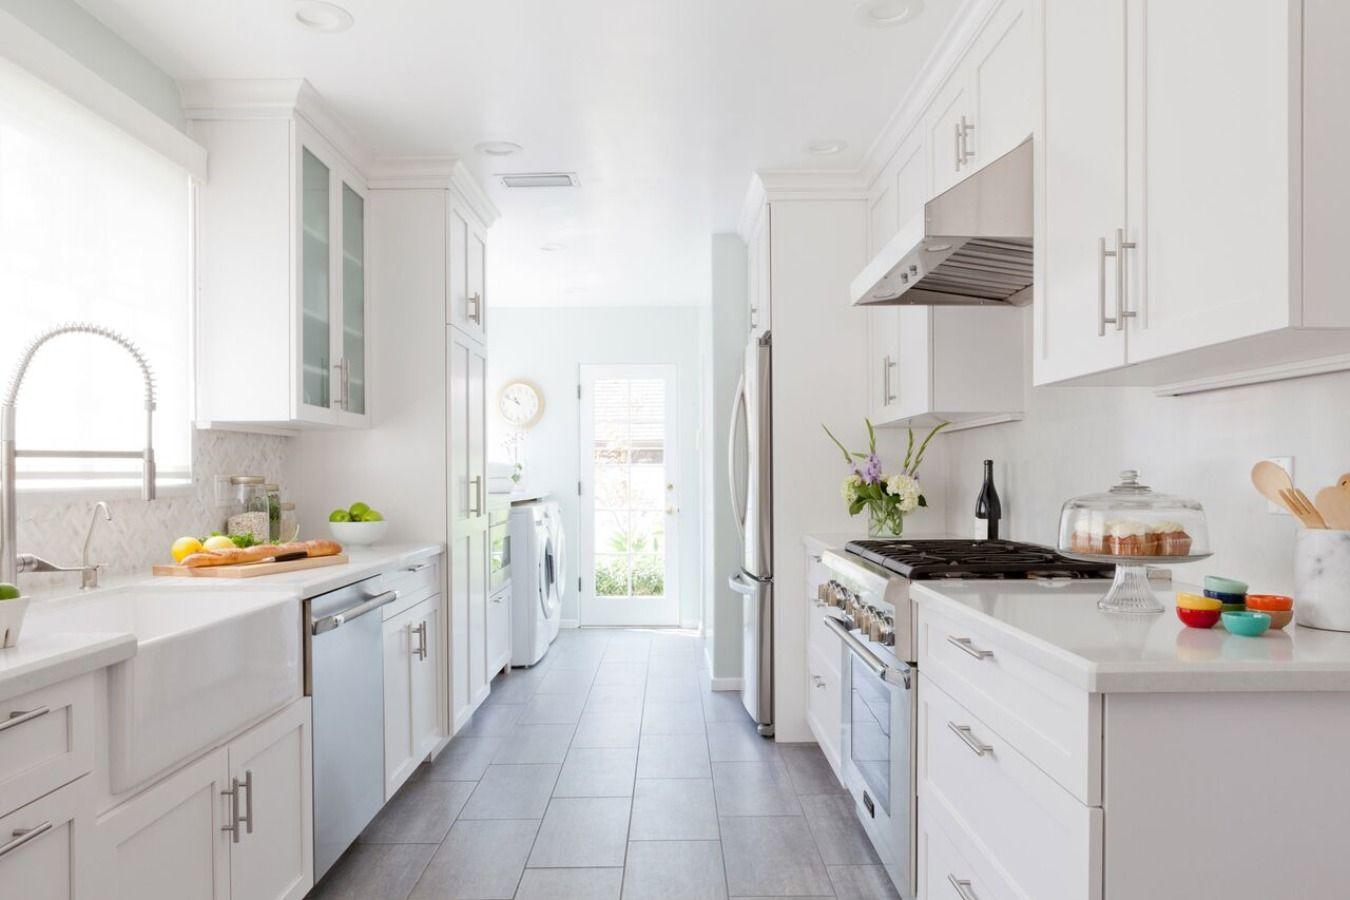 Galley Kitchen Remodels | Galley Style Kitchen Designs | Small Kitchen Layouts Galley